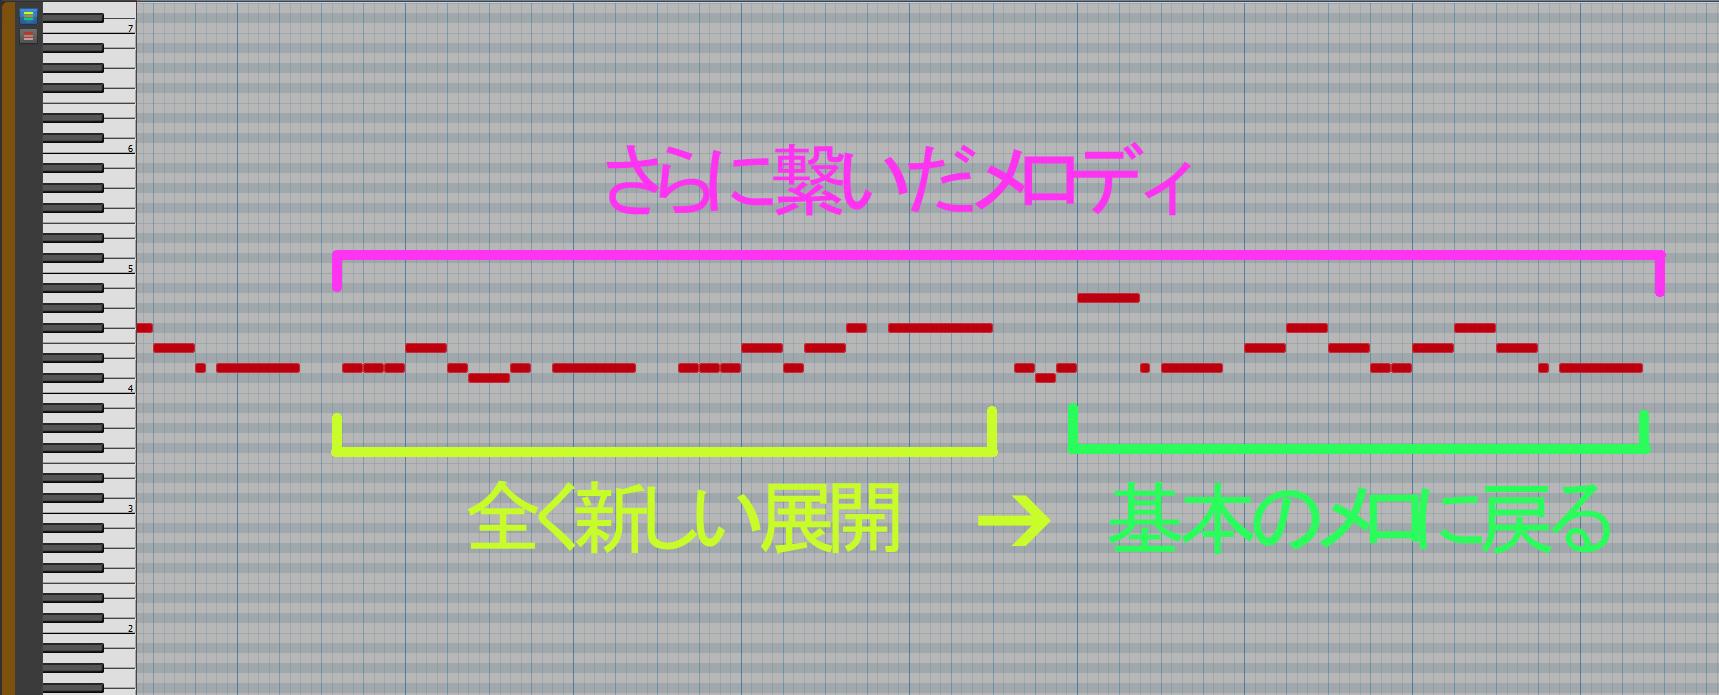 jk_melody_midi_3_tx